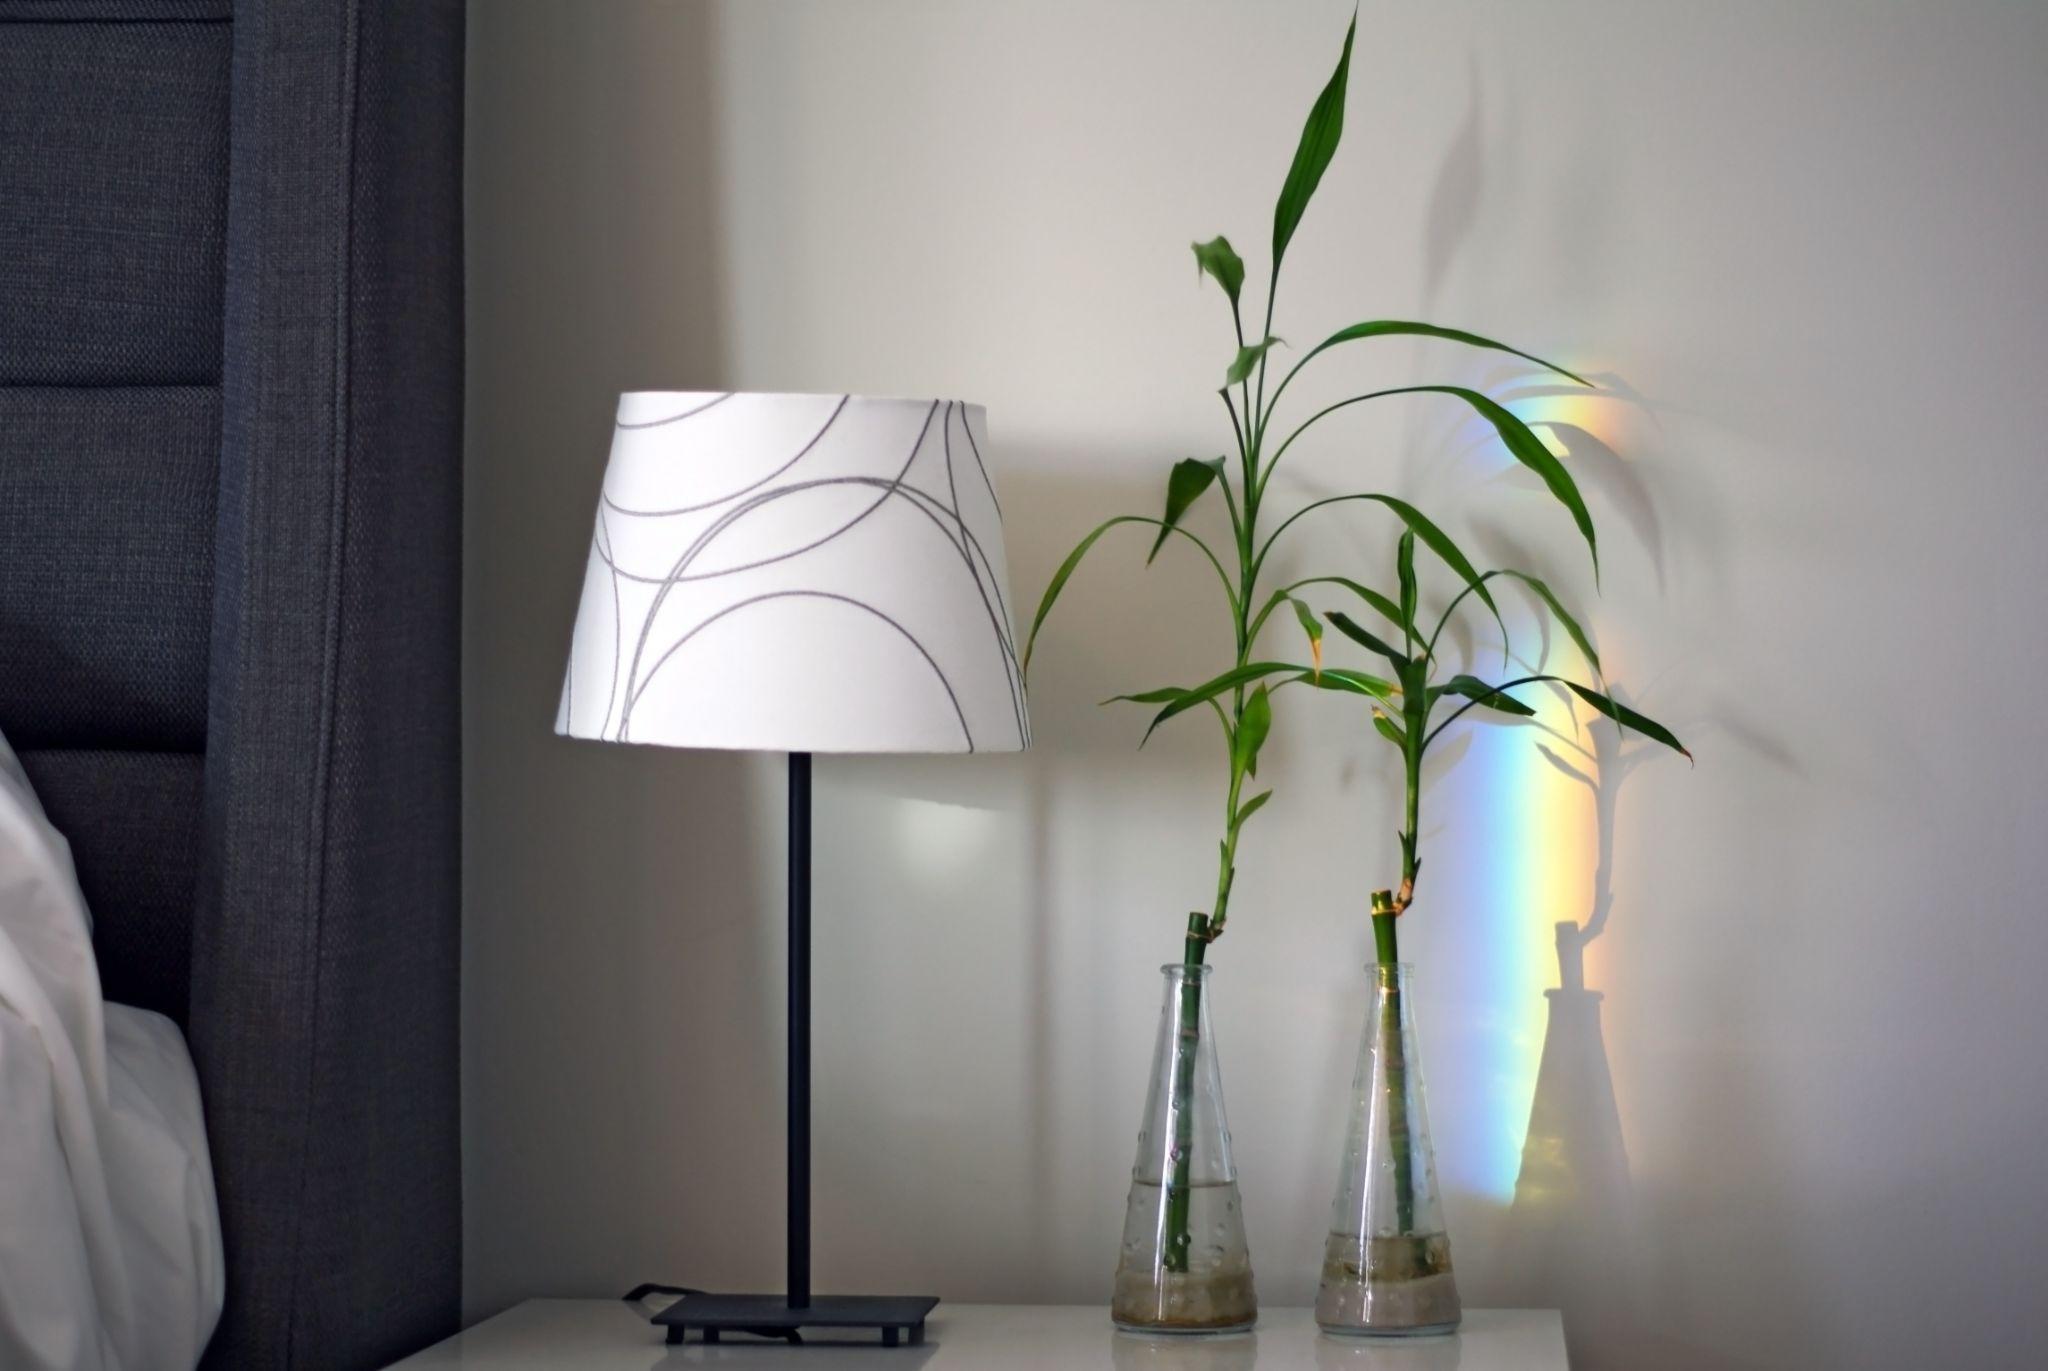 bambu da sorte no quarto